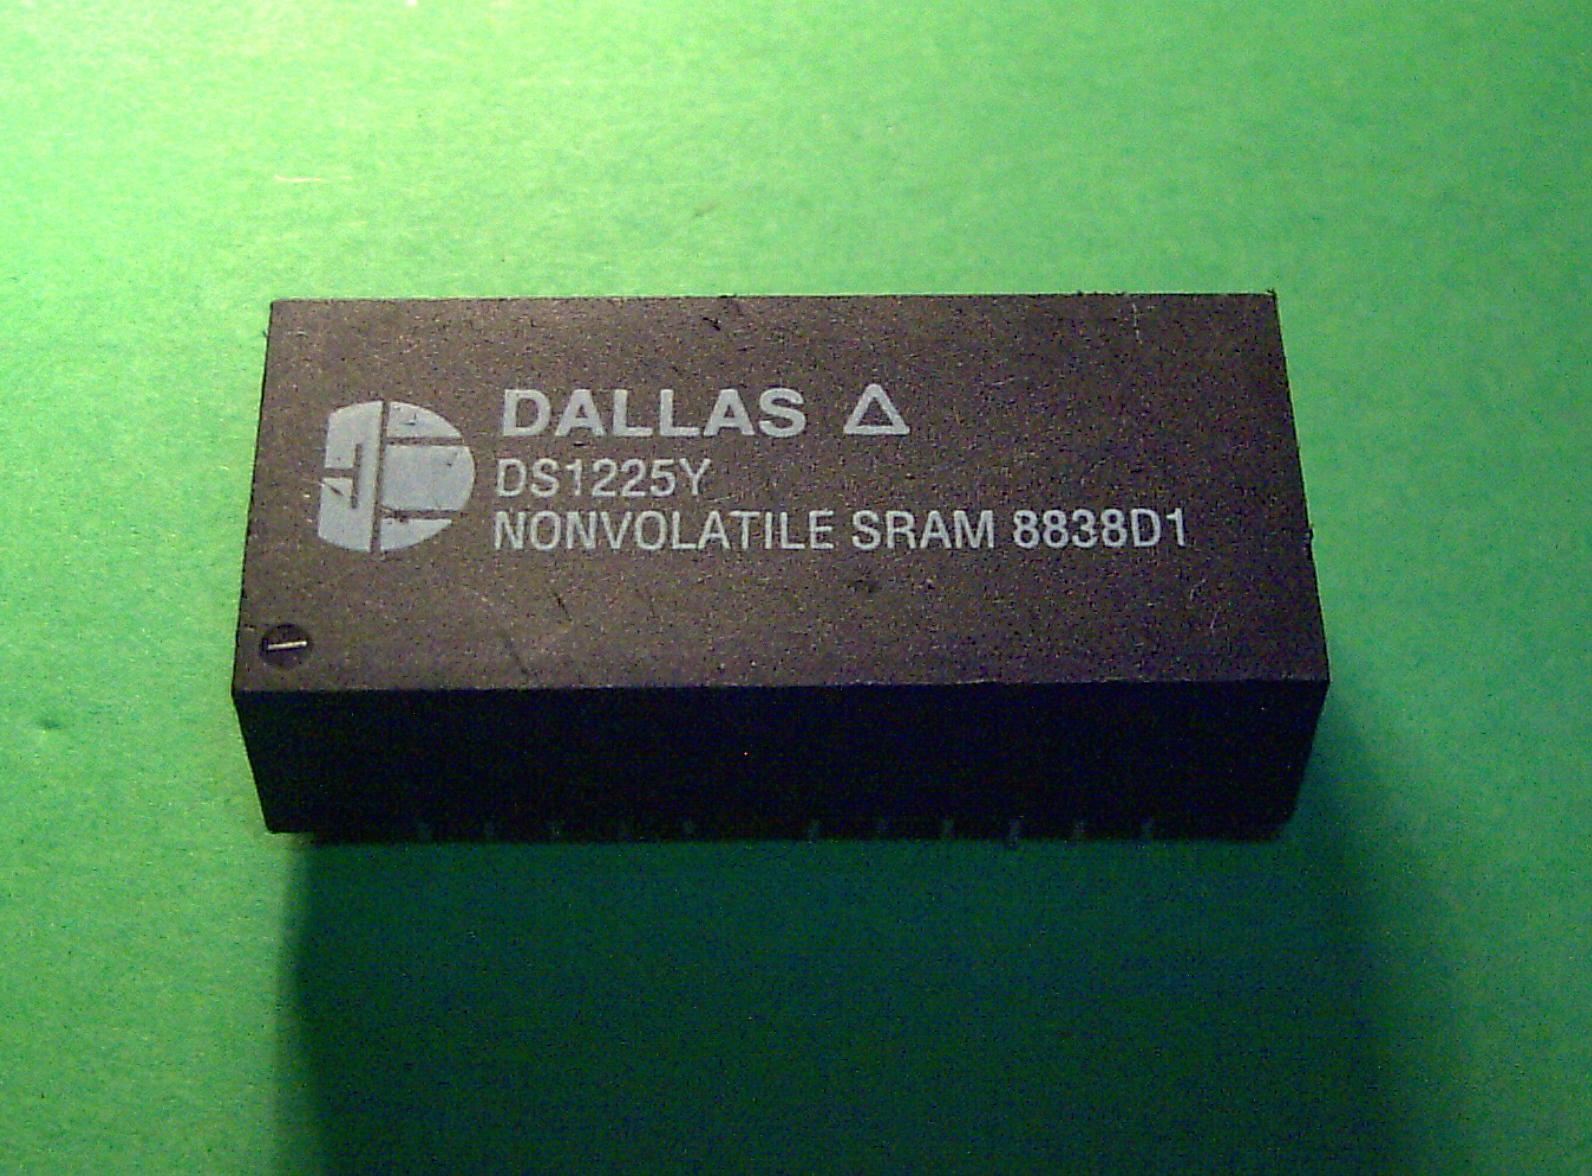 Memoria NVRAM (Imagen sacada de Wikipedia)